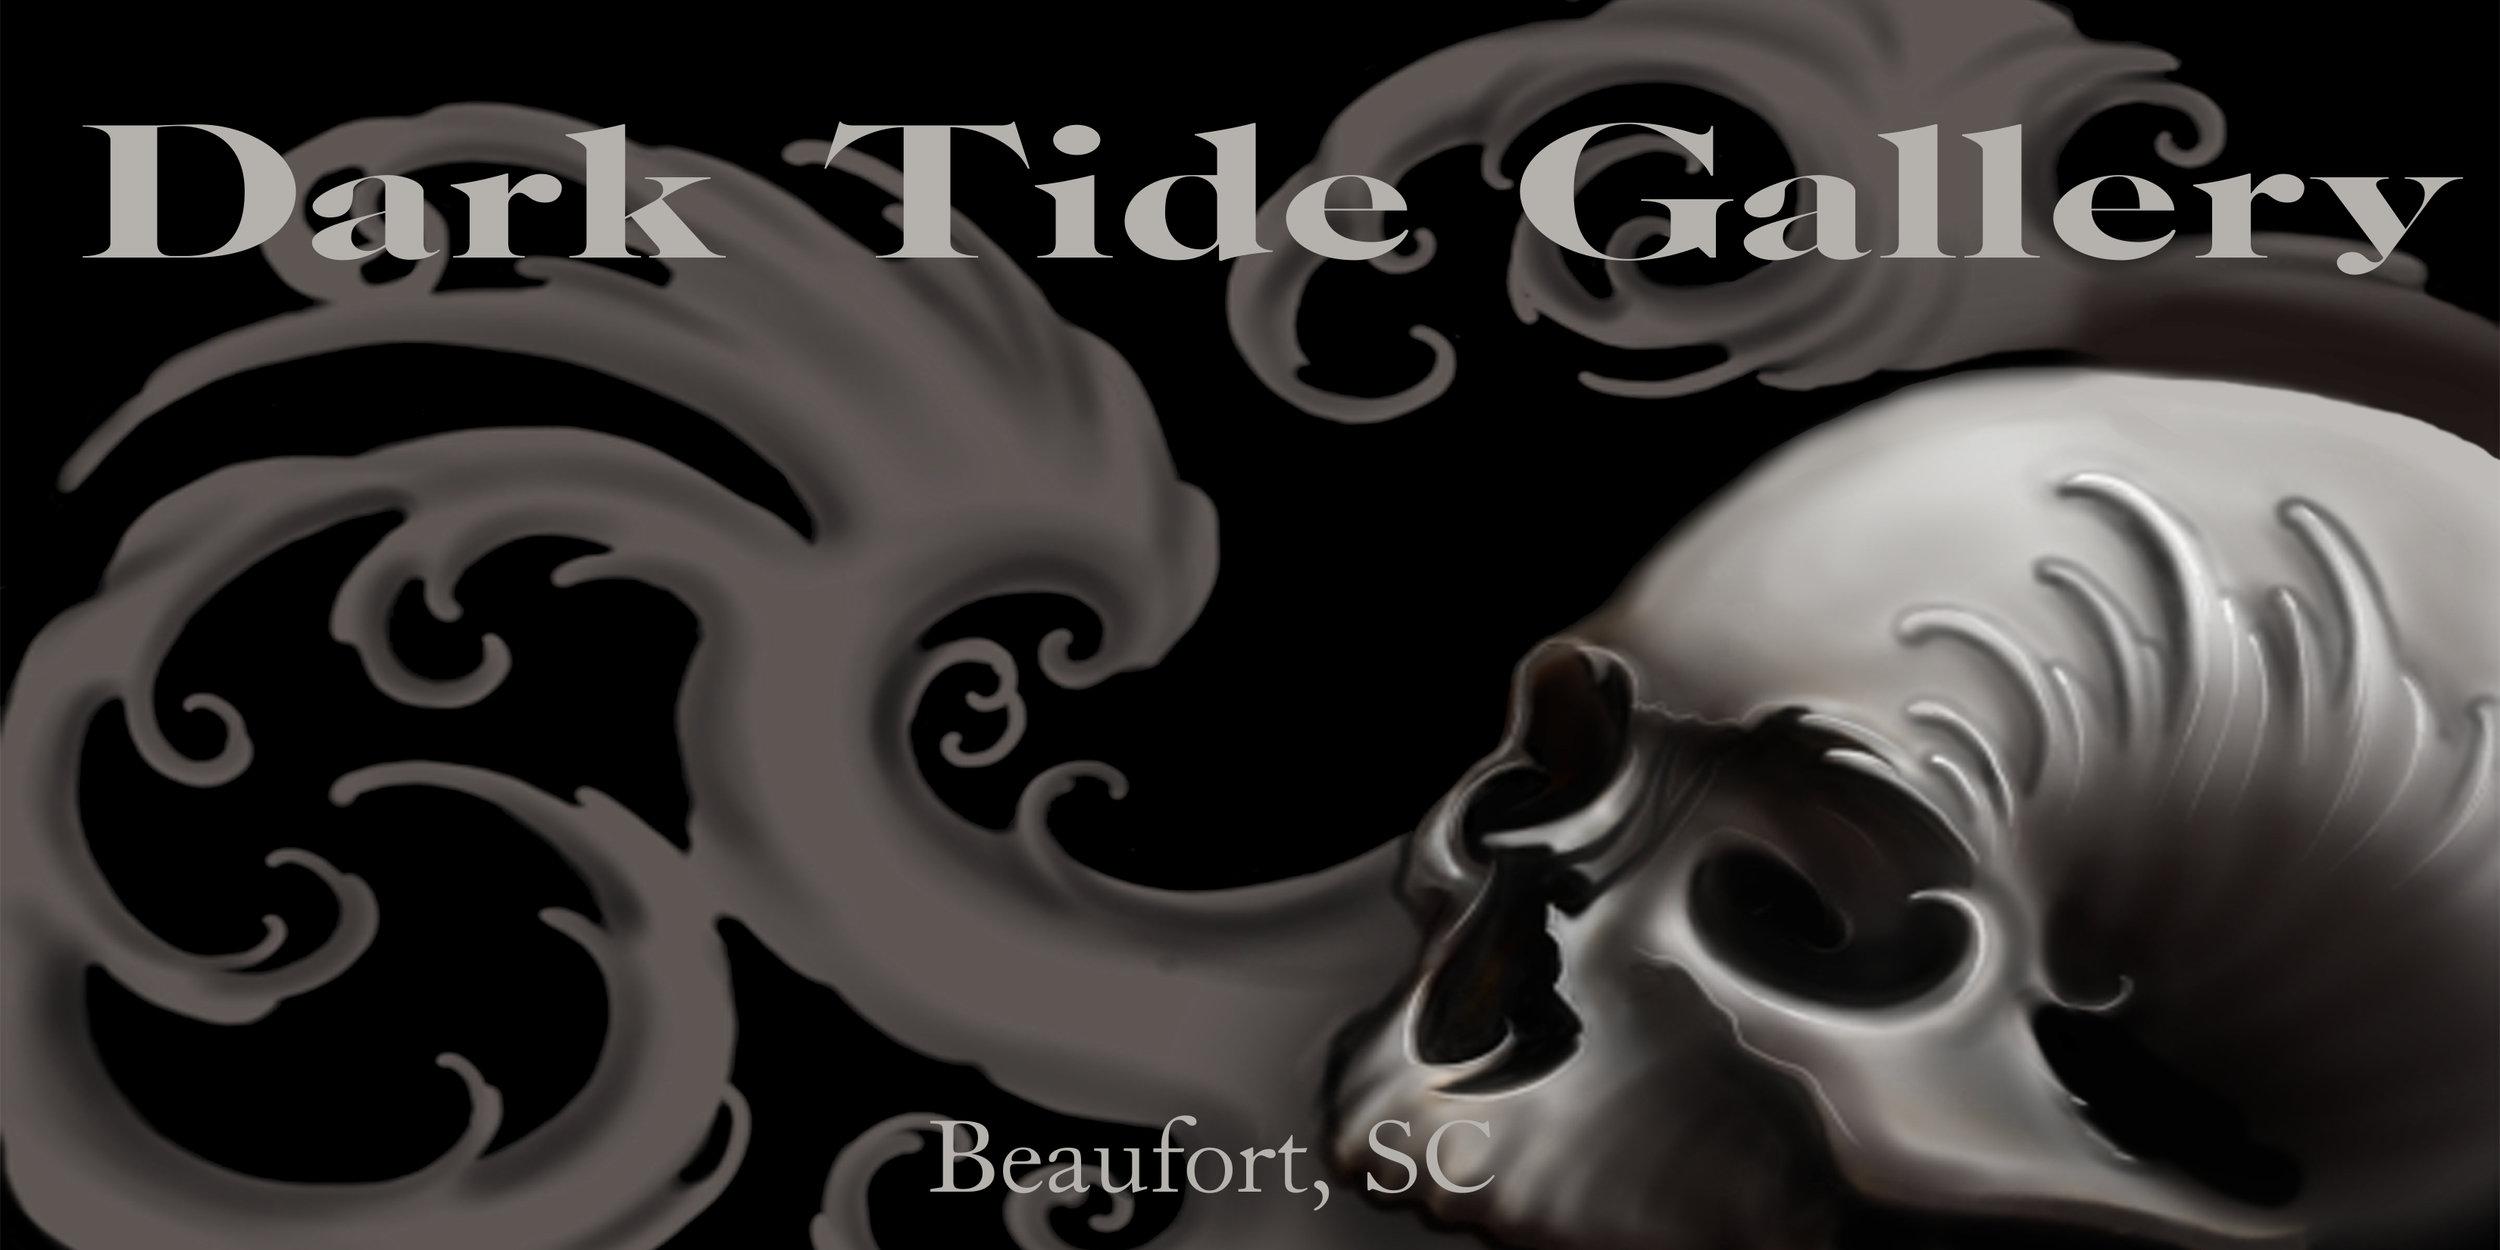 Dark_Tide_Gallery_Banner.jpg